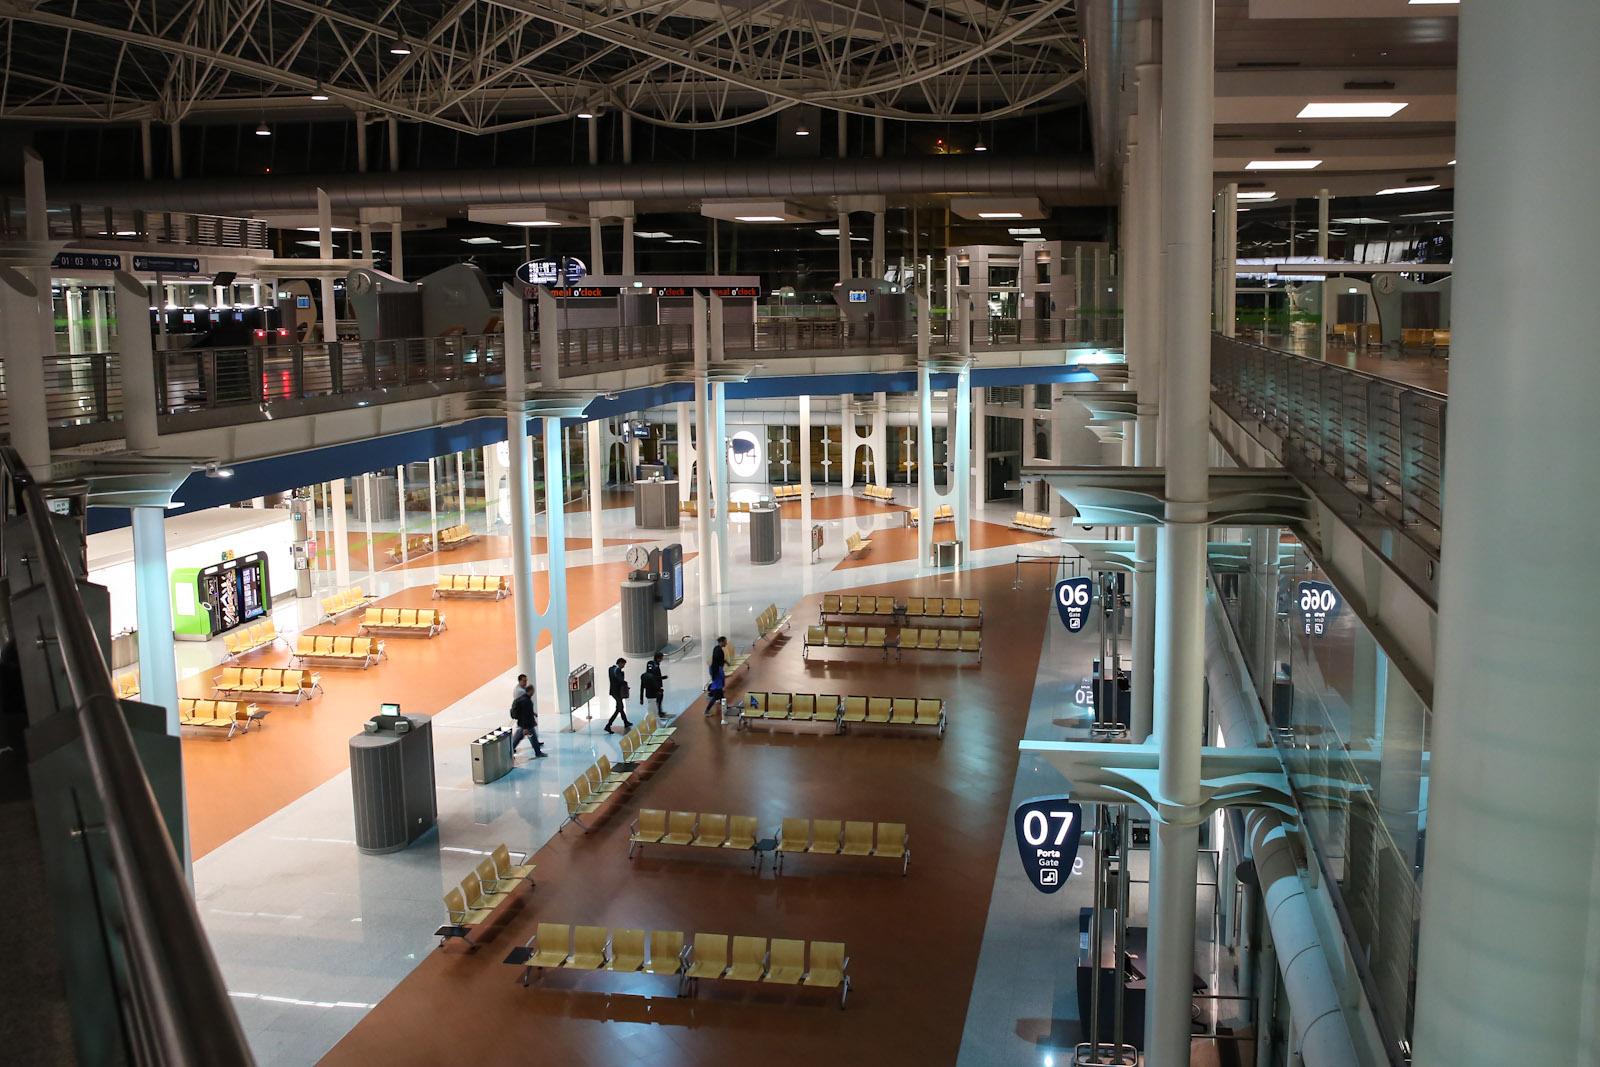 Залы ожидания перед выходами на посадку в аэропорту Порту Франциско Корнейро